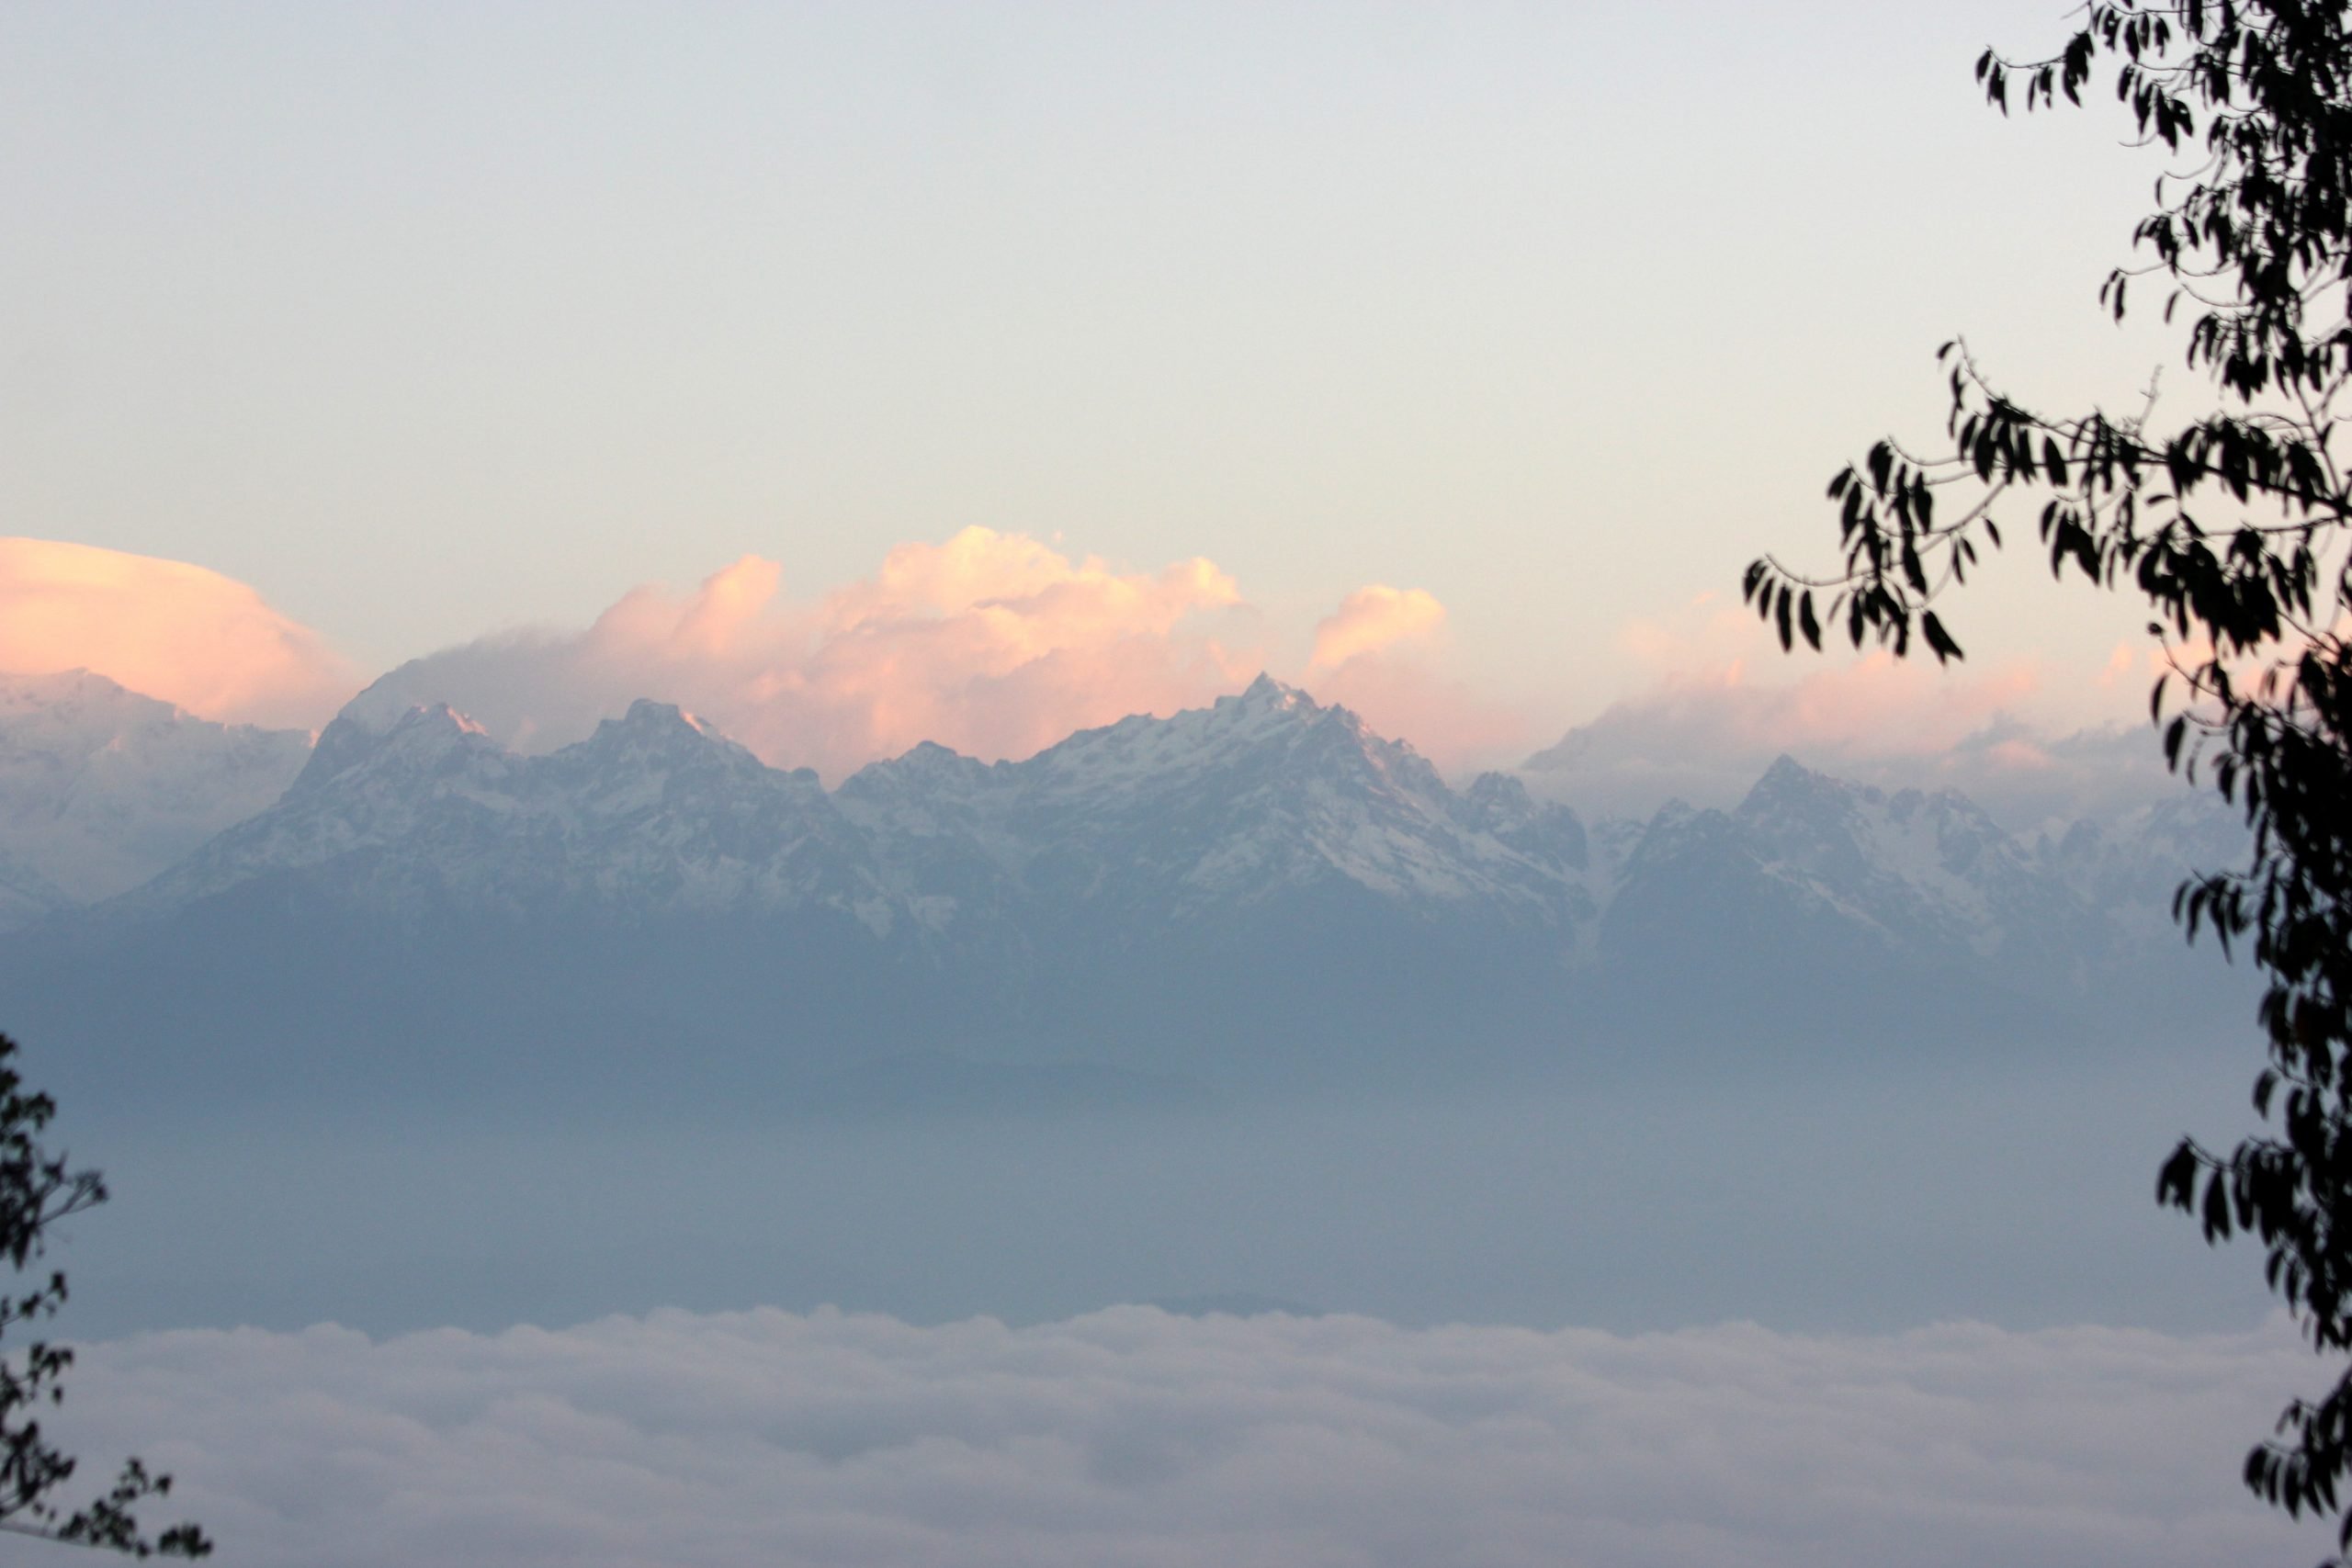 Sunrise Scenery on the Mountain